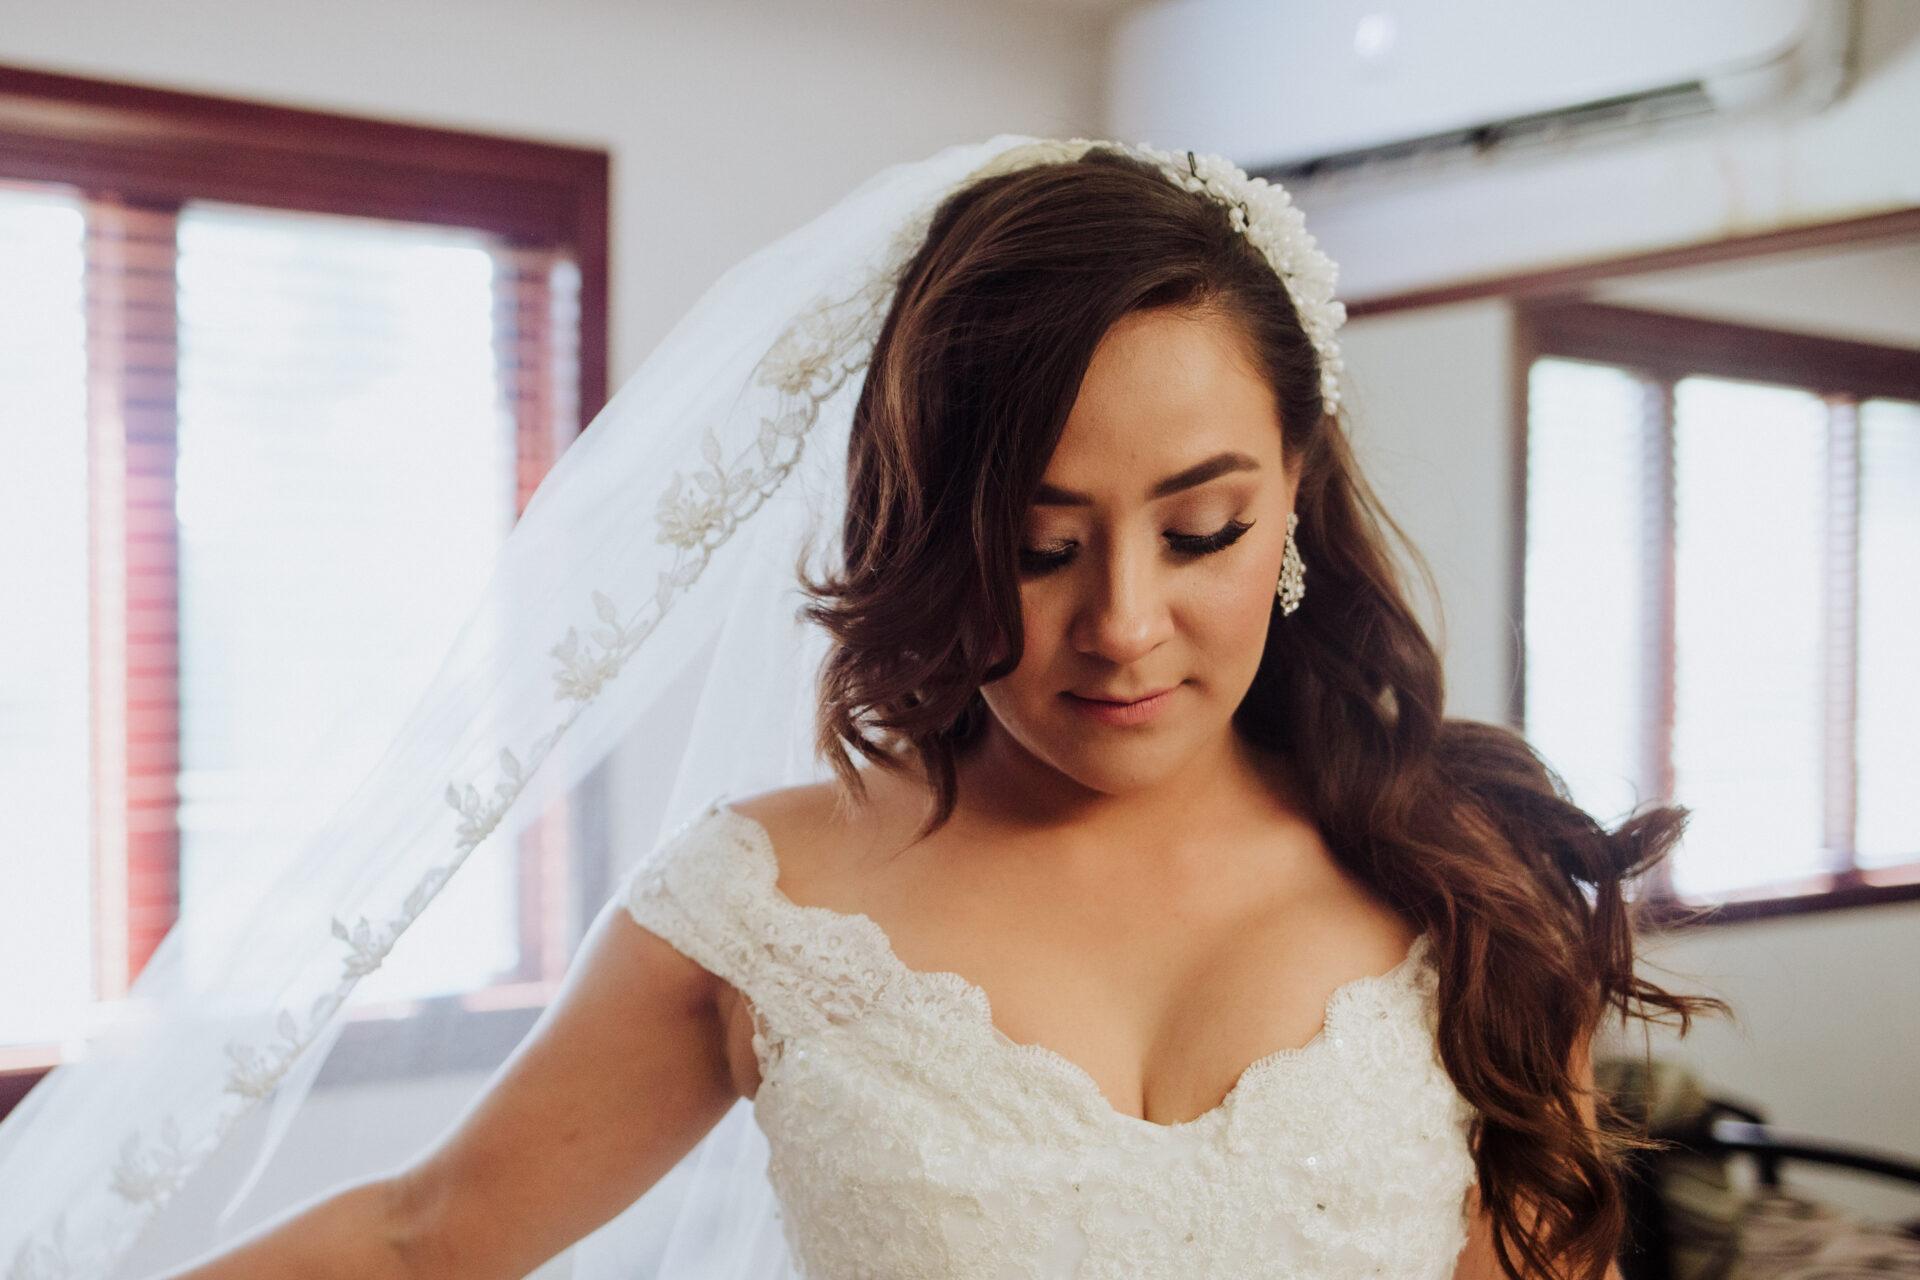 javier_noriega_fotografo_bodas_torreon_coahuila_zacatecas_wedding_photographer16a